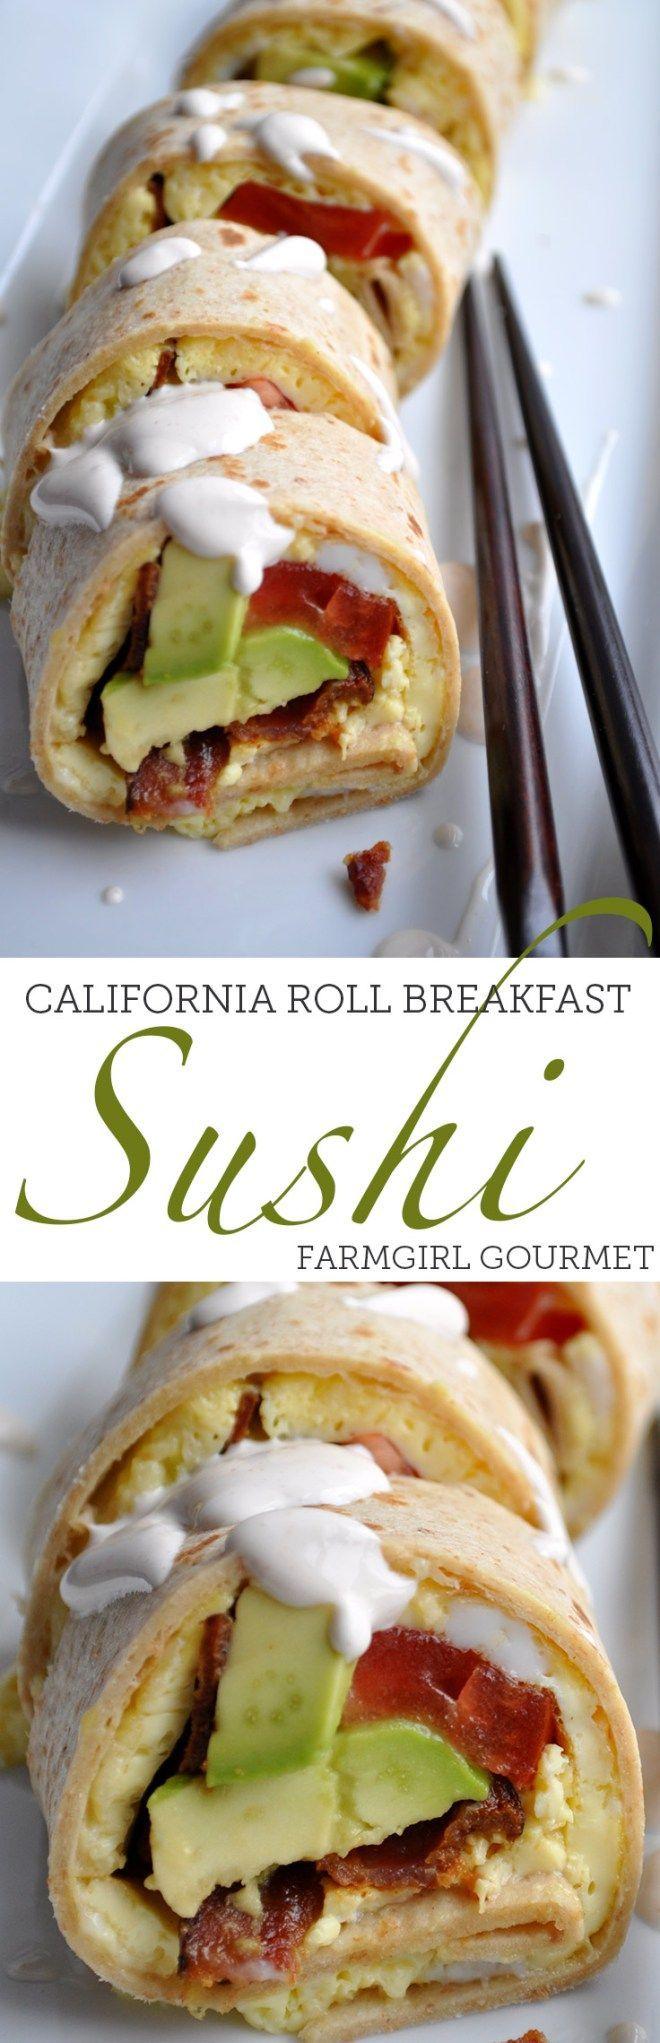 California Roll Breakfast Sushi - Farmgirl Gourmet